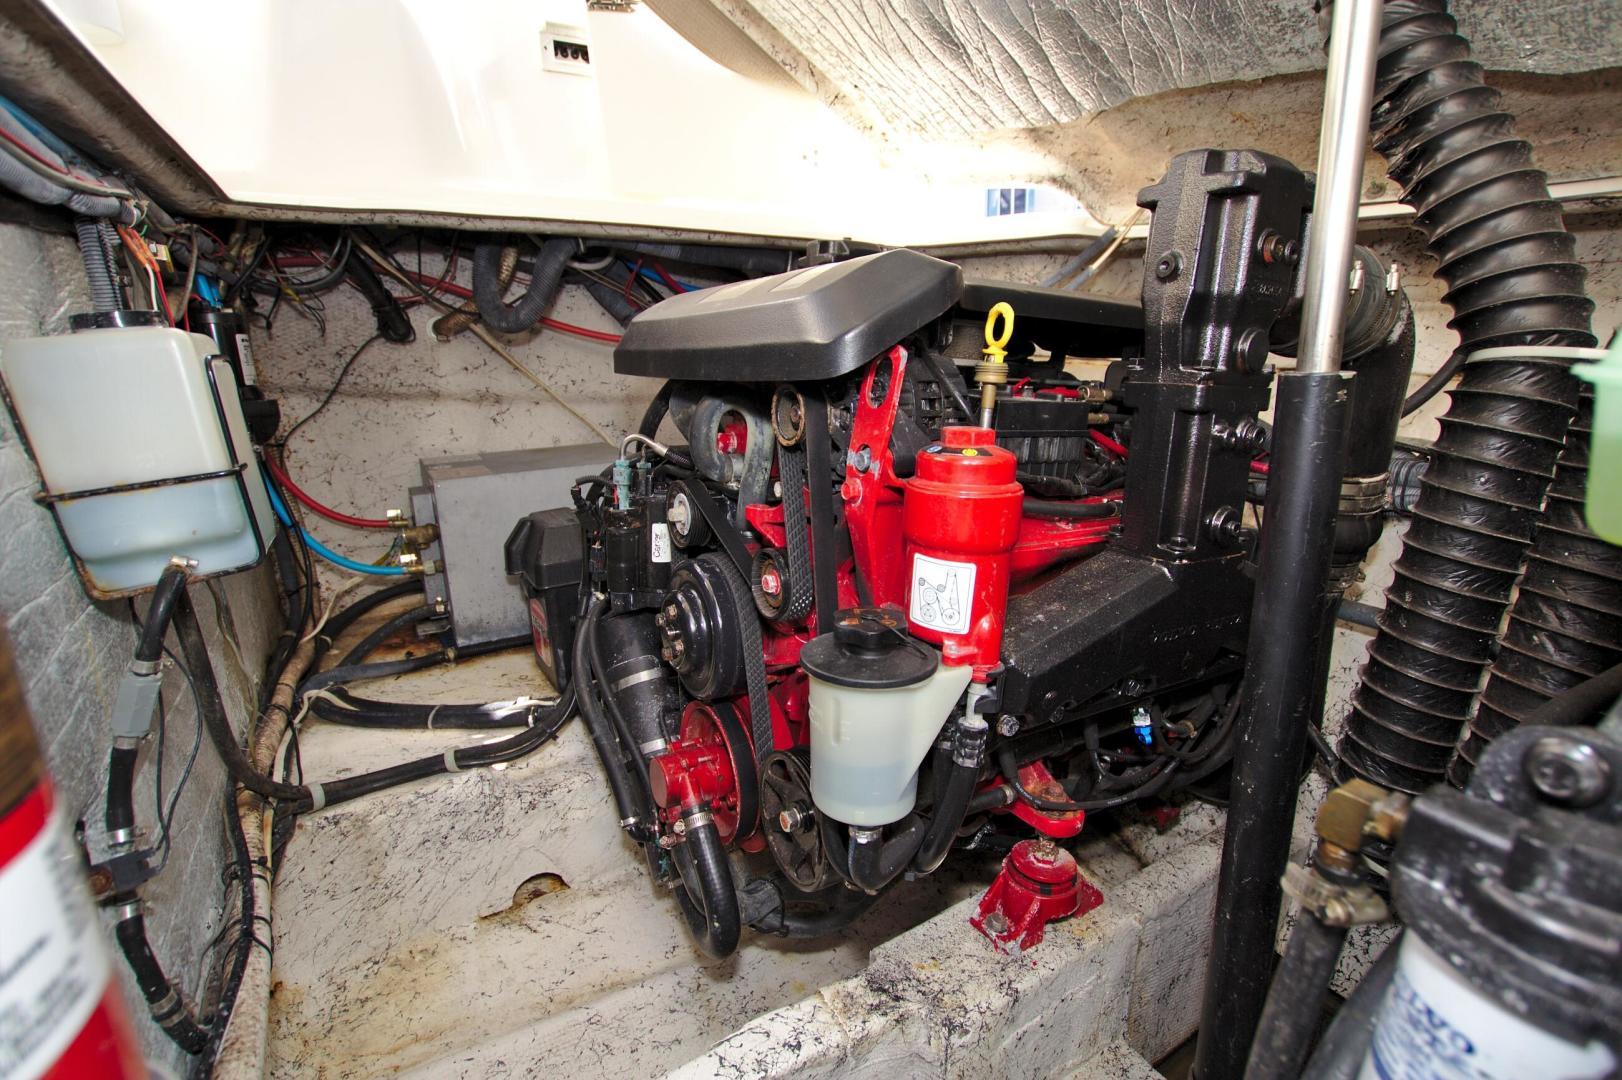 Rinker-342 Express Cruiser 2006-Salt Shaker Palmetto-Florida-United States-1587742 | Thumbnail